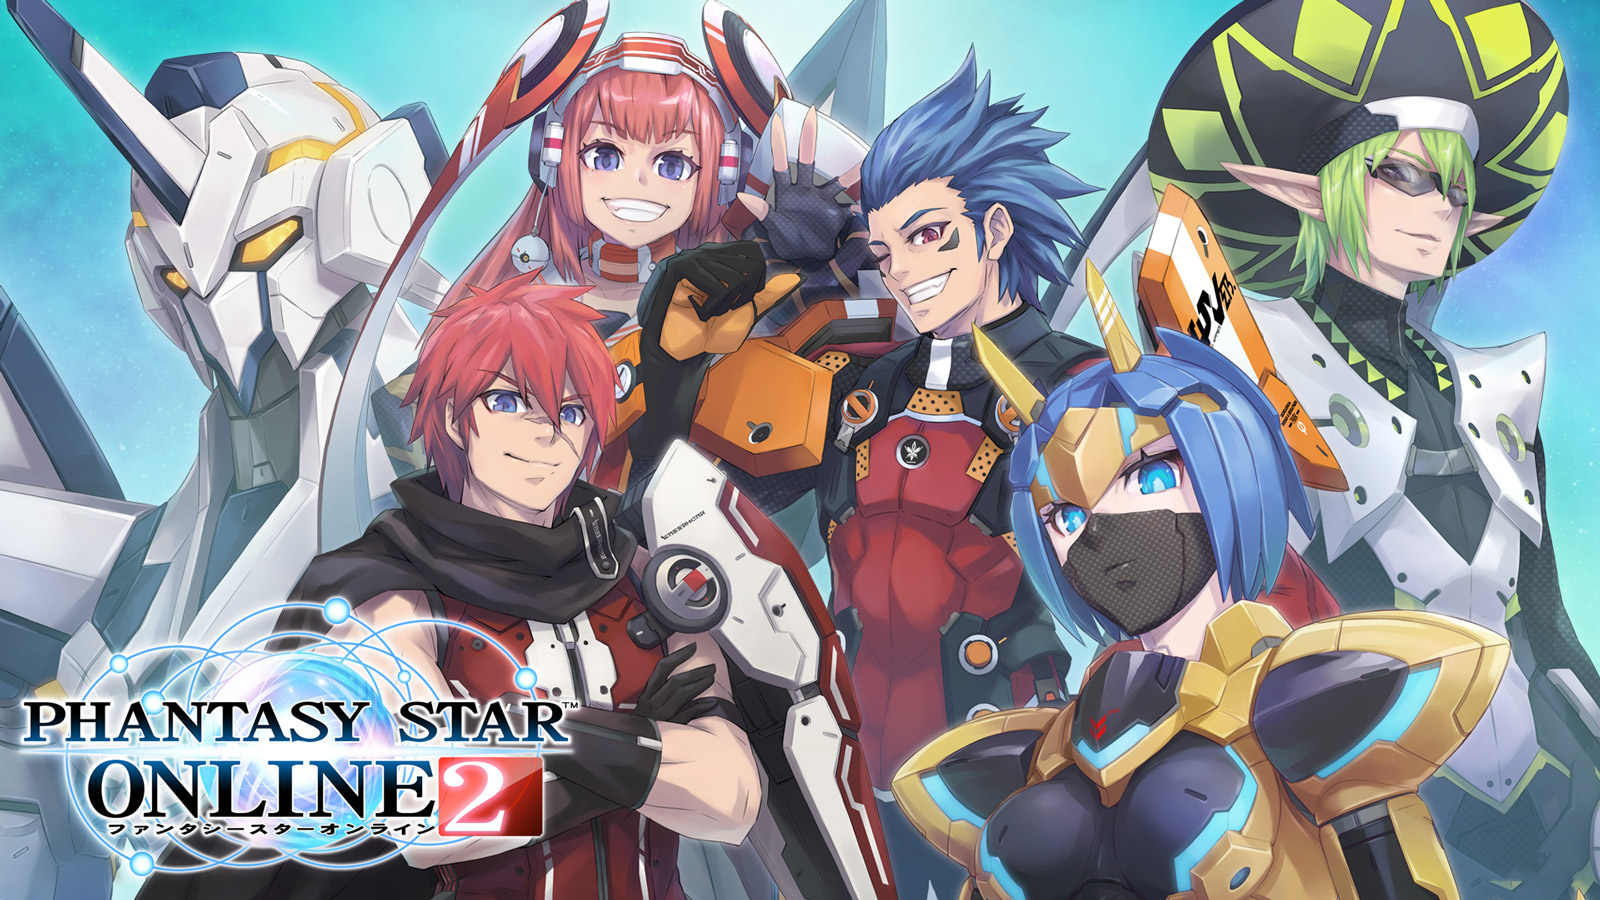 Free Phantasy Star Online 2 Wallpaper in 1600x900